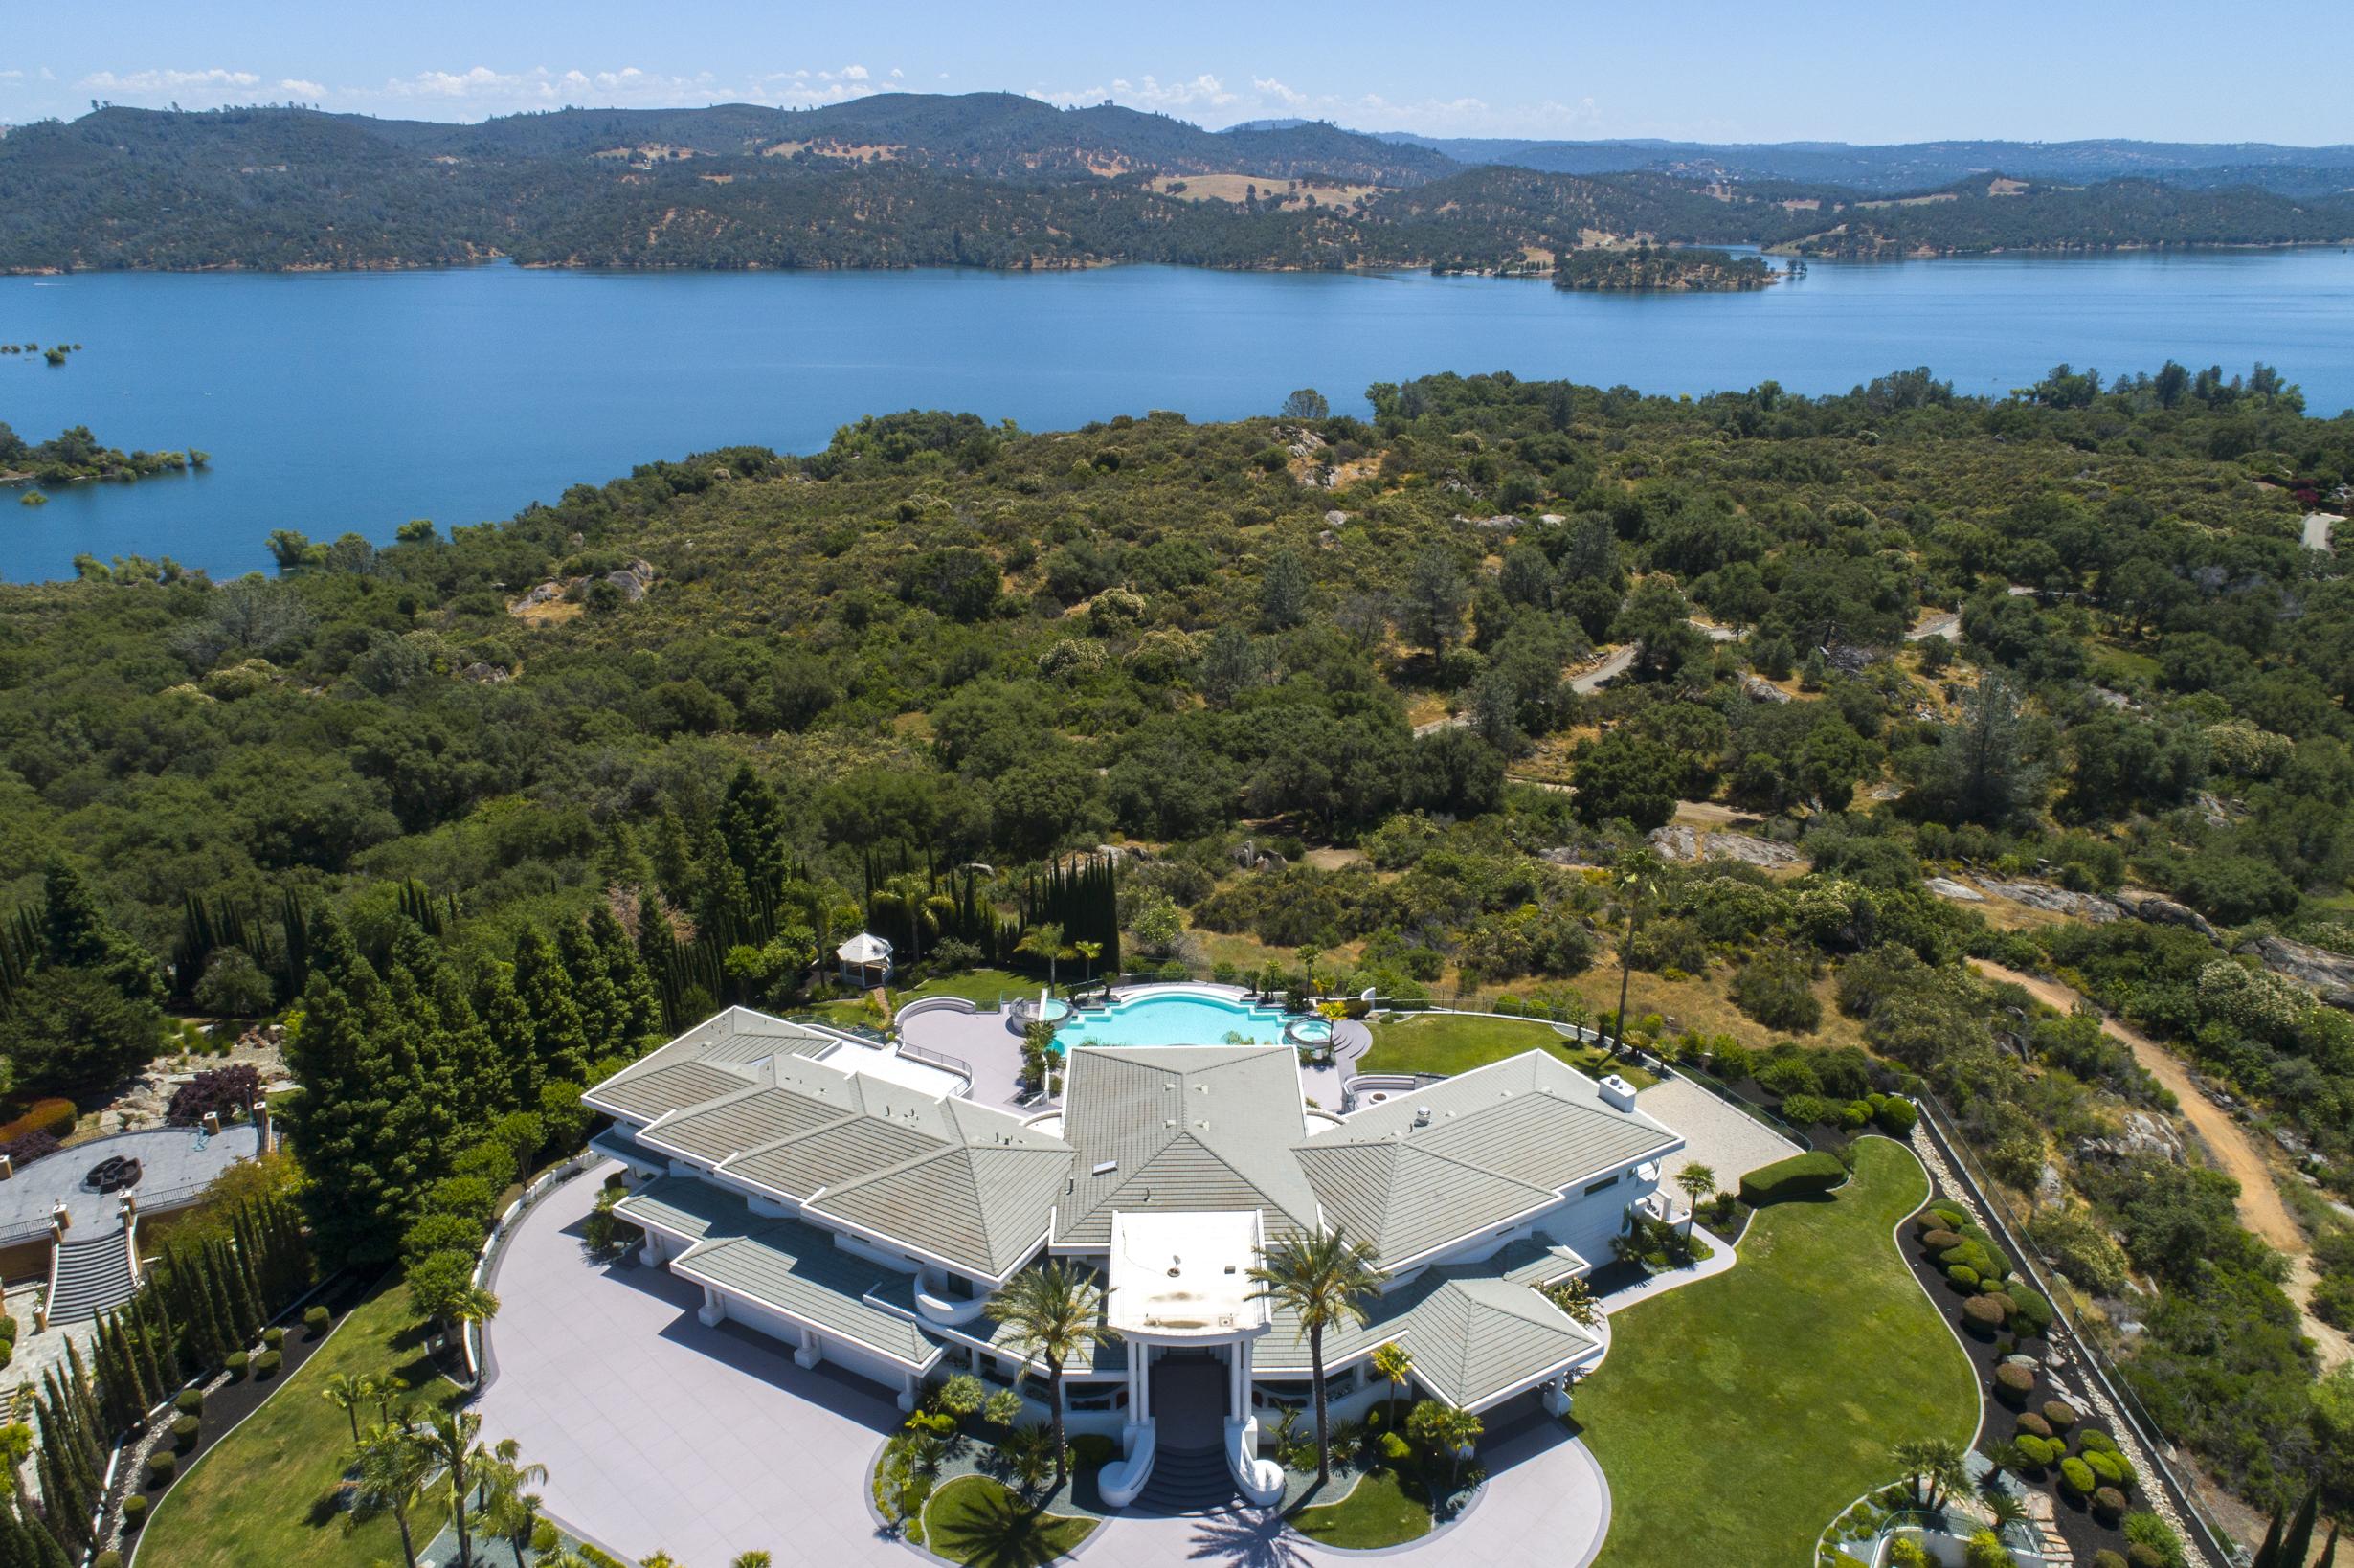 9125 Vista De Lago - Exterior with Pool 14.jpg